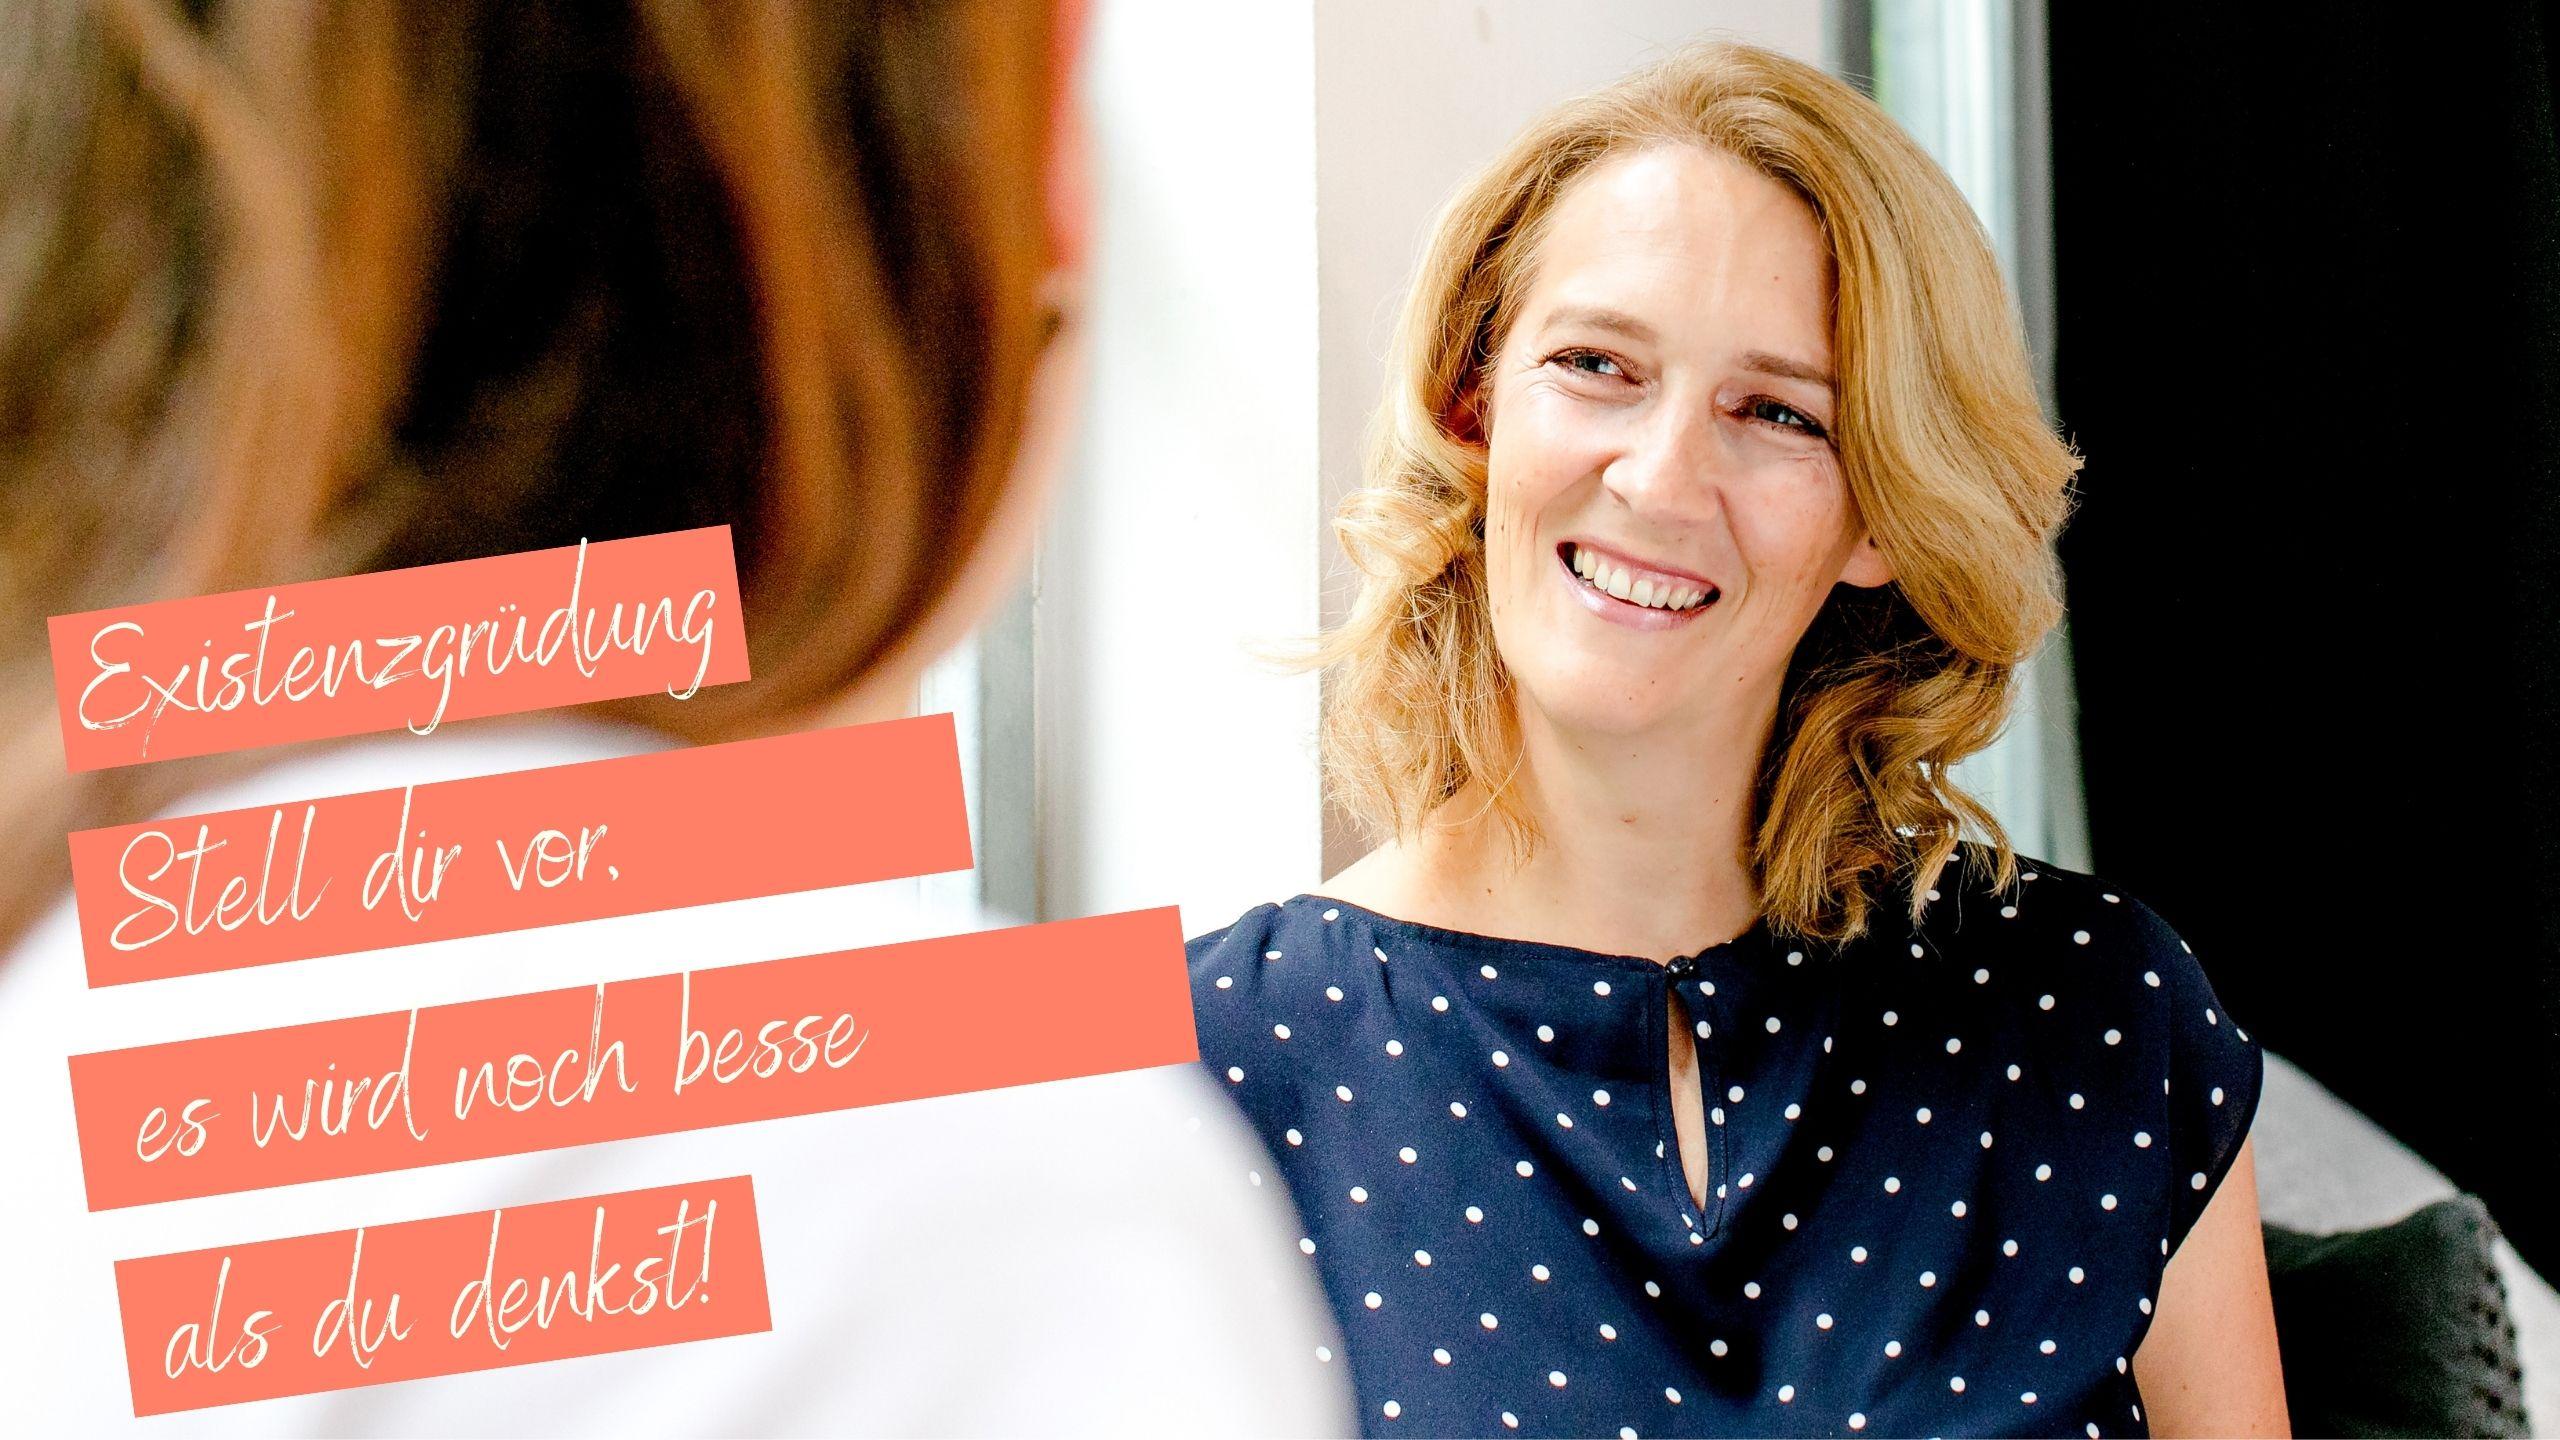 Michala Schächner Business Coach Stuttgart Existenzgründung